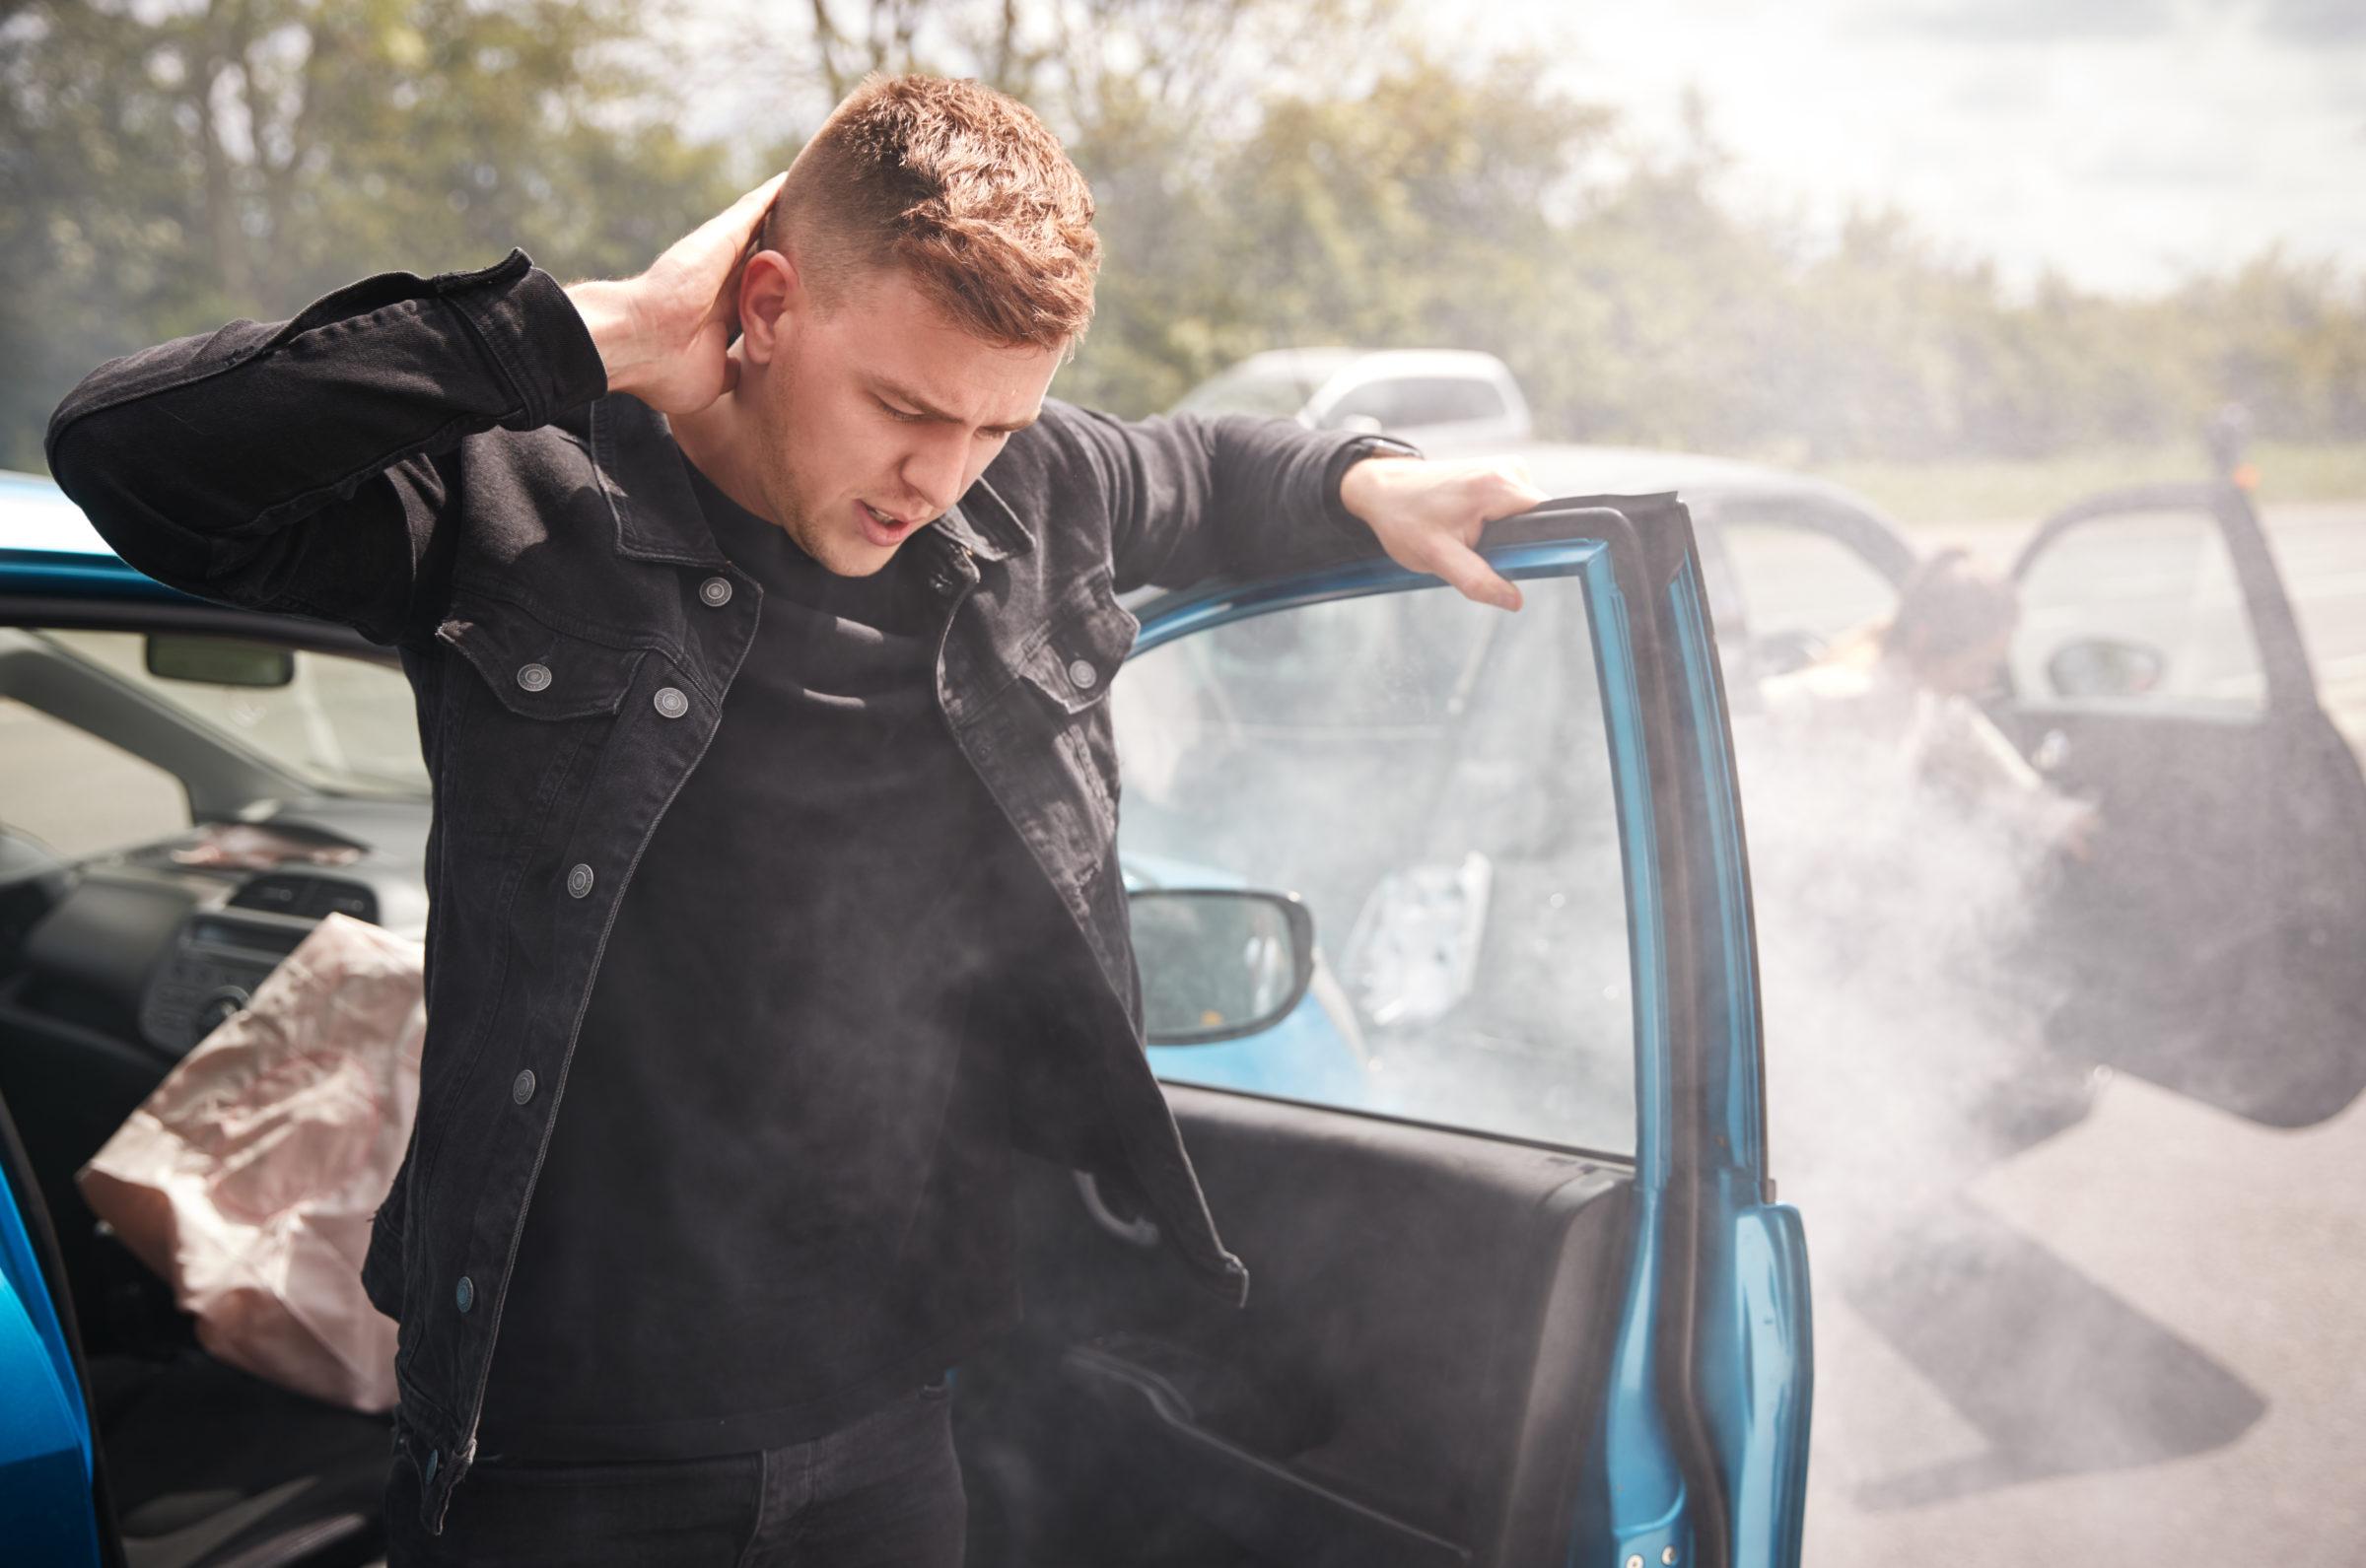 male motorist with whiplash injury in car crash ge ZR97WYQ 1